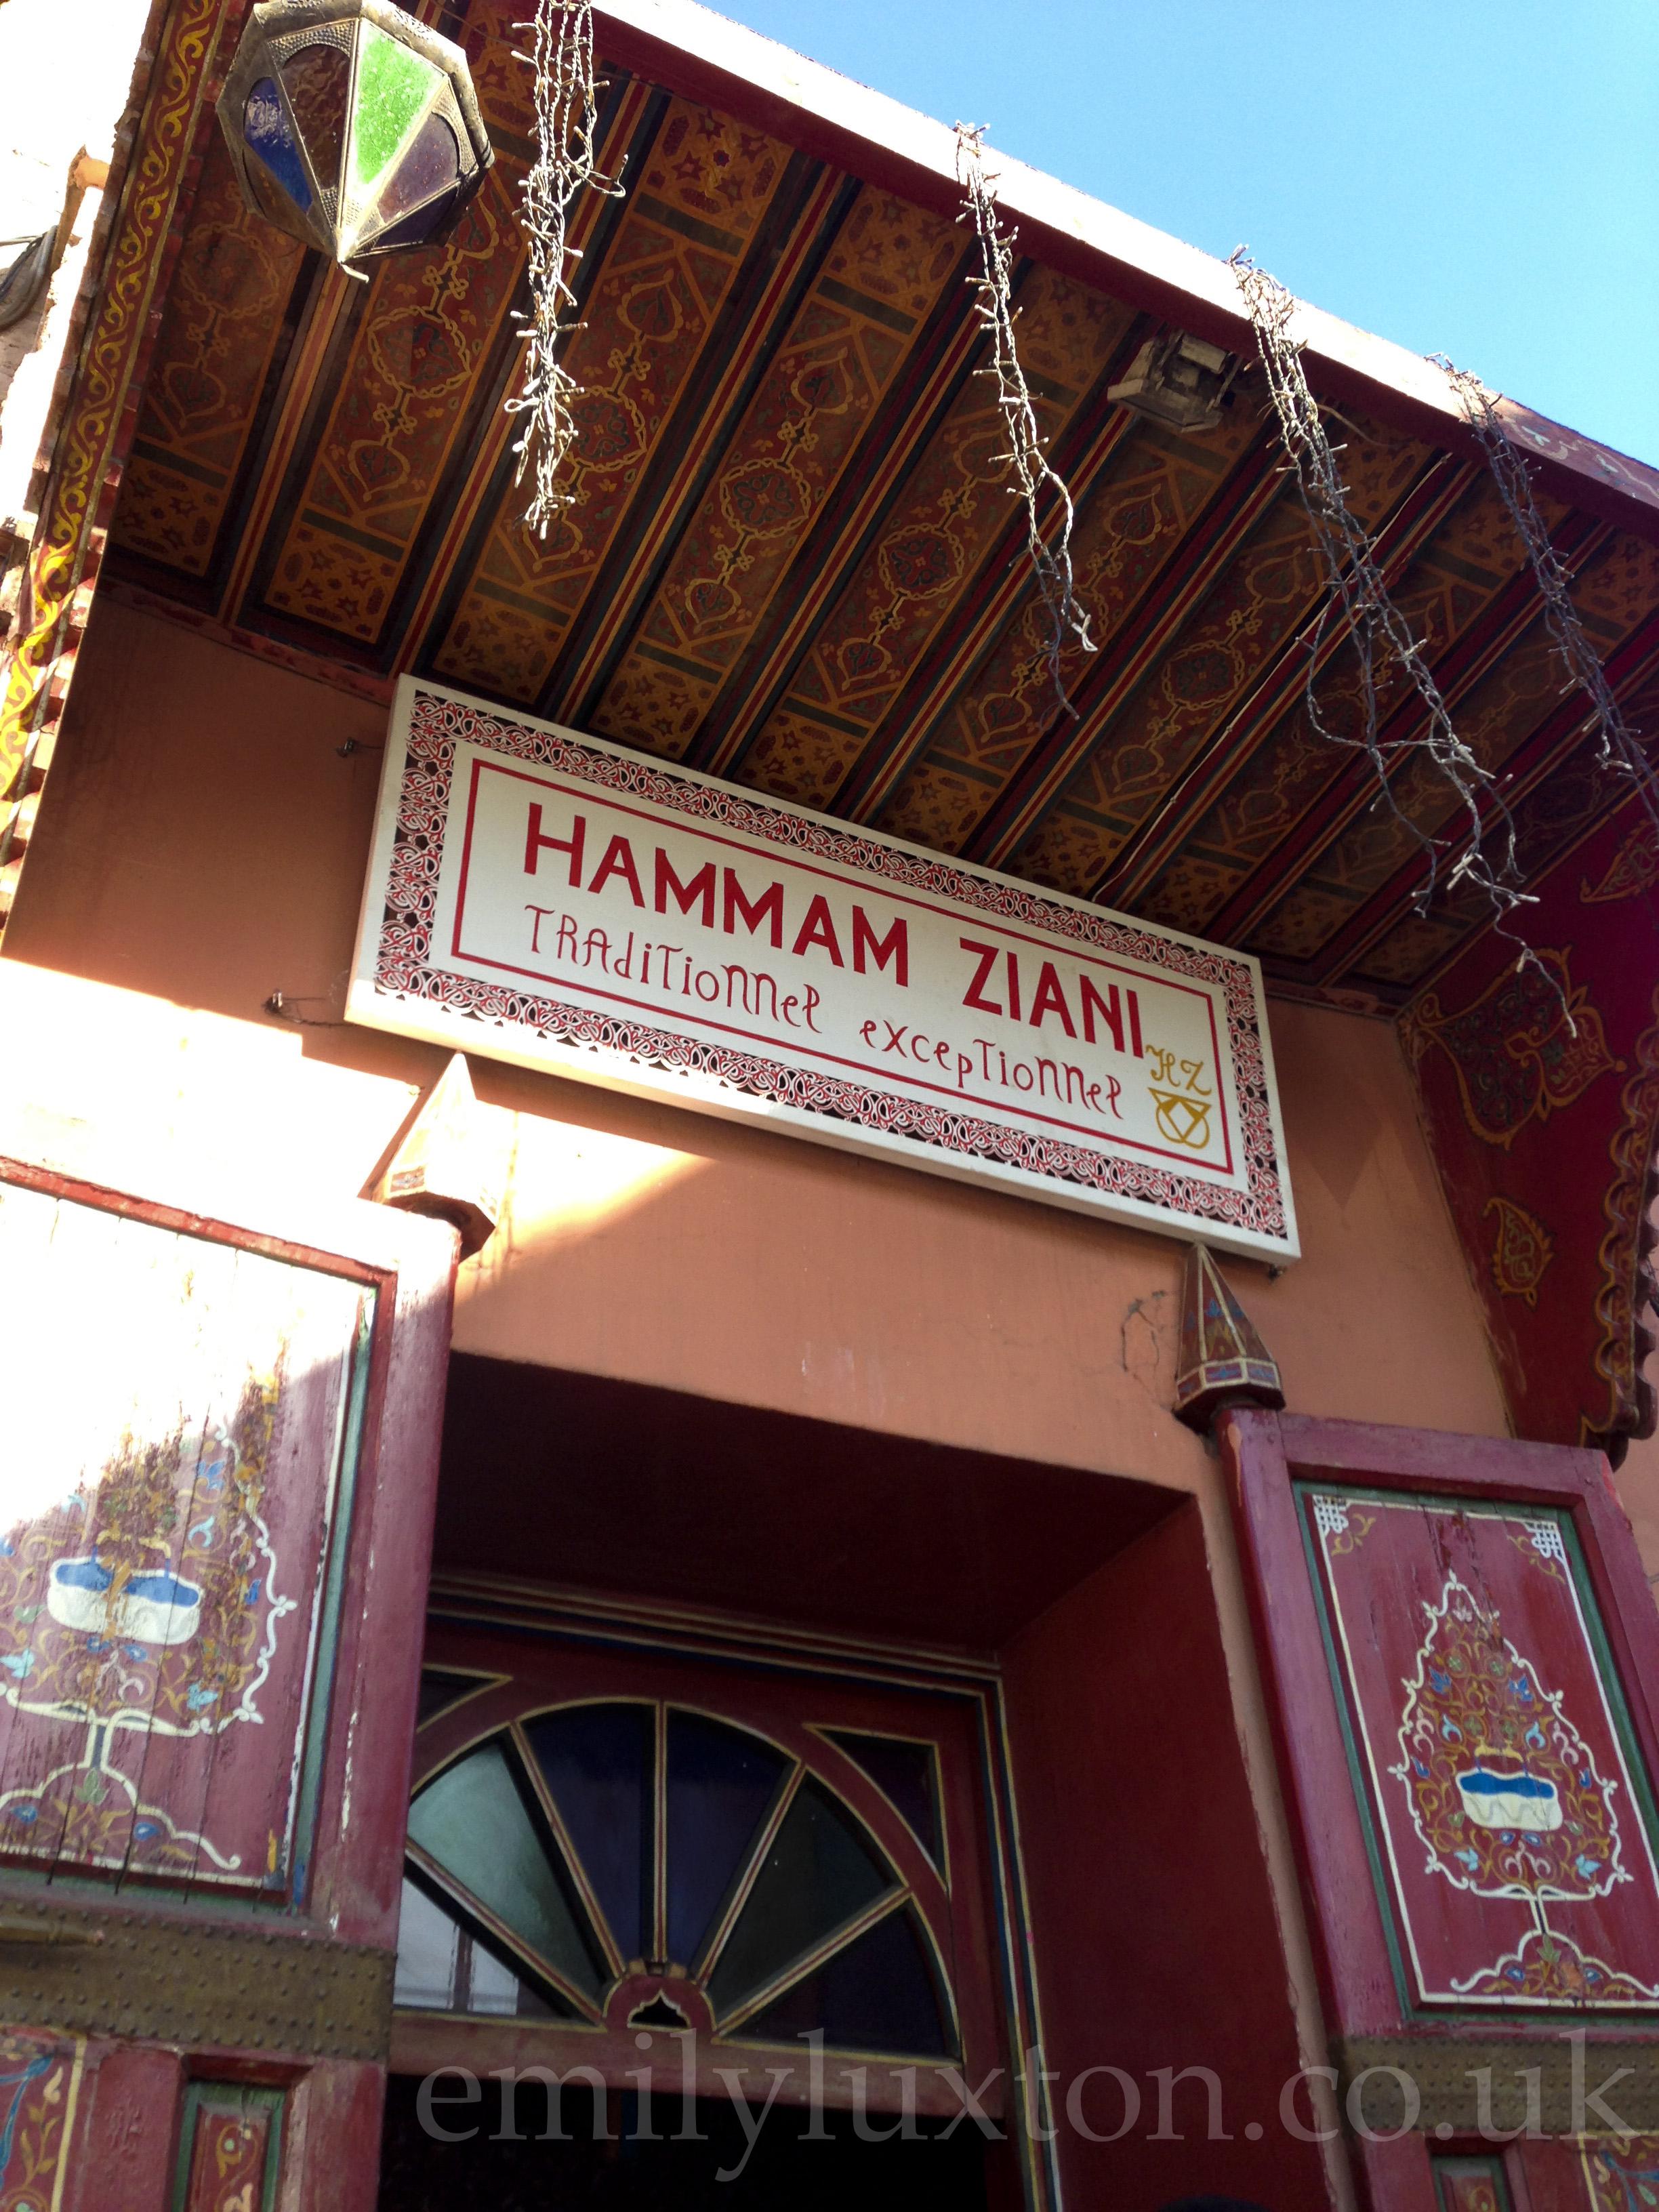 Hammam Ziani